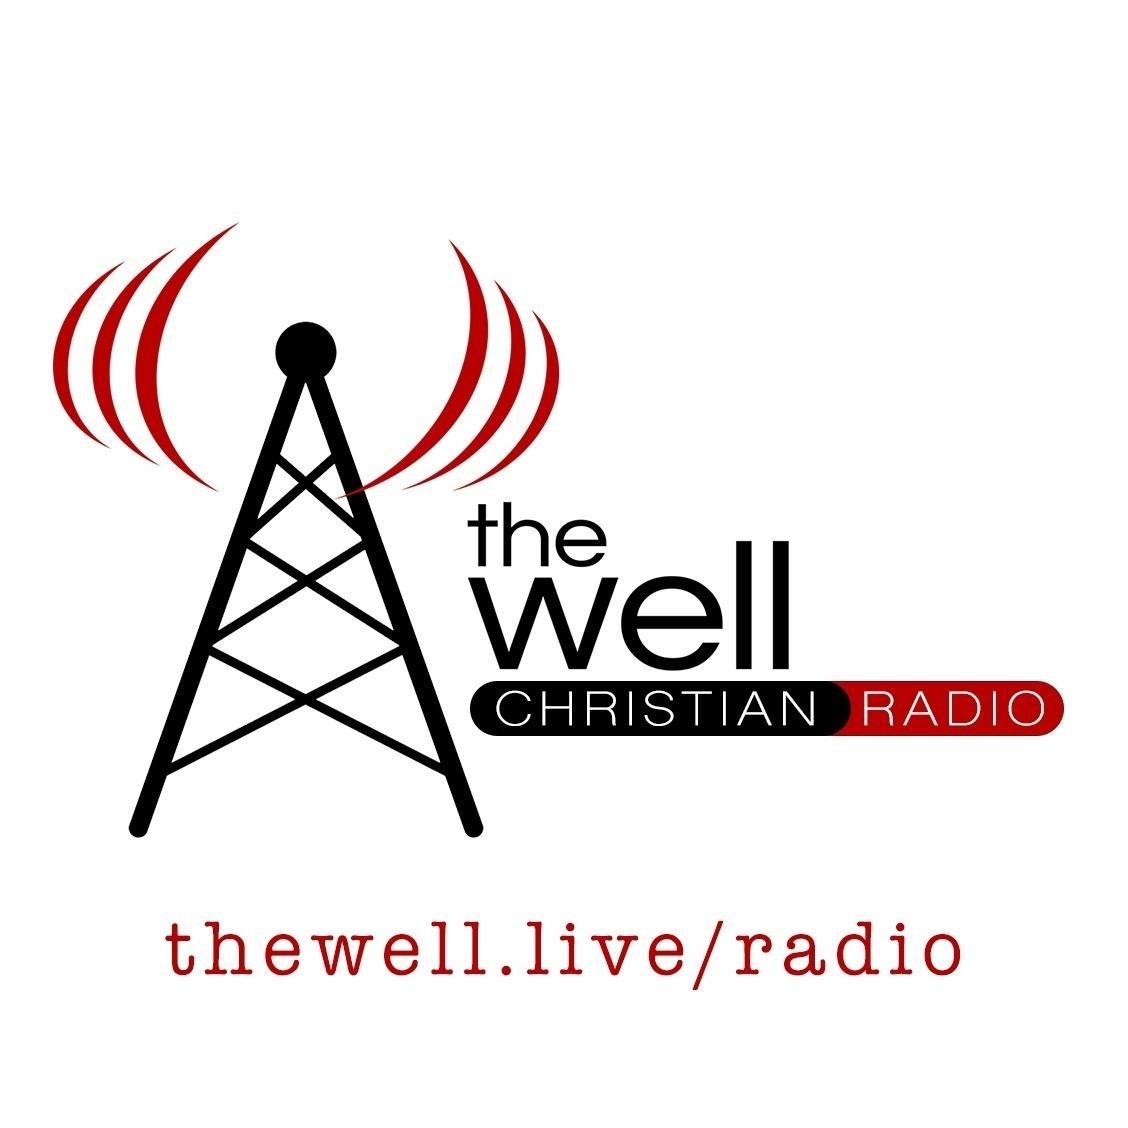 Profilo The Well Radio Canale Tv